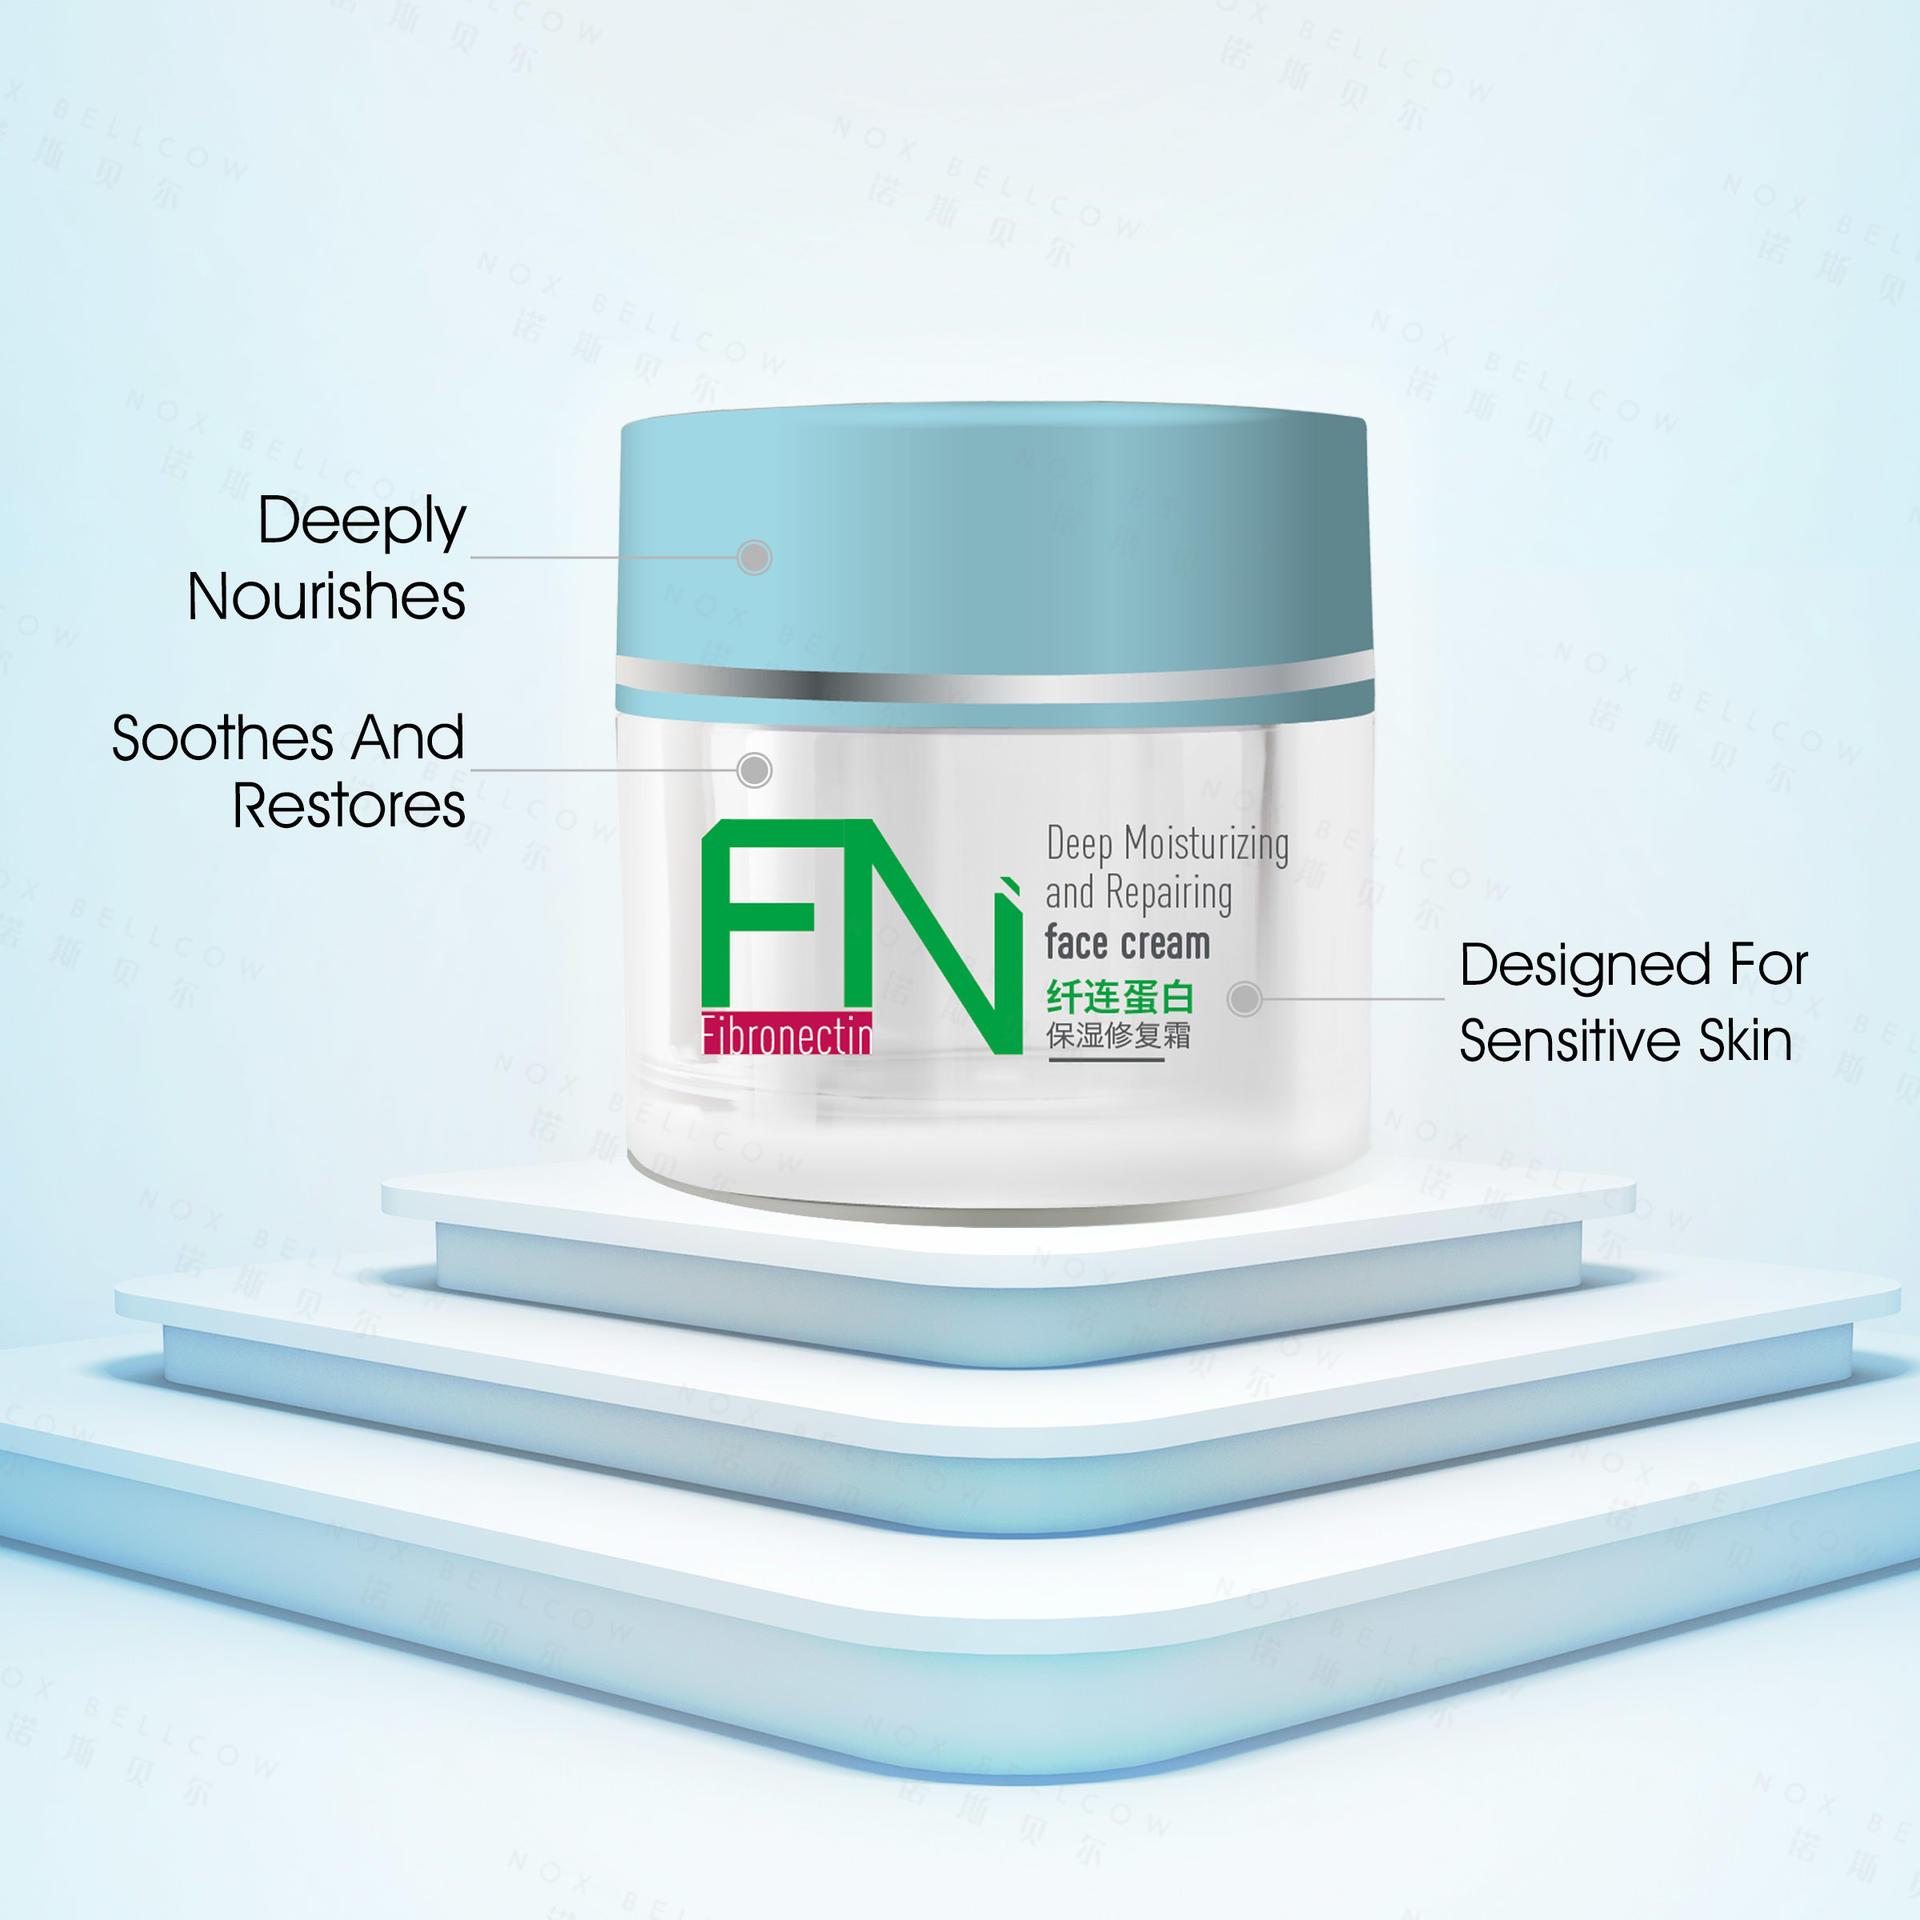 FN (Fibronectin) Deep Moisturizing and Repairing Face Cream